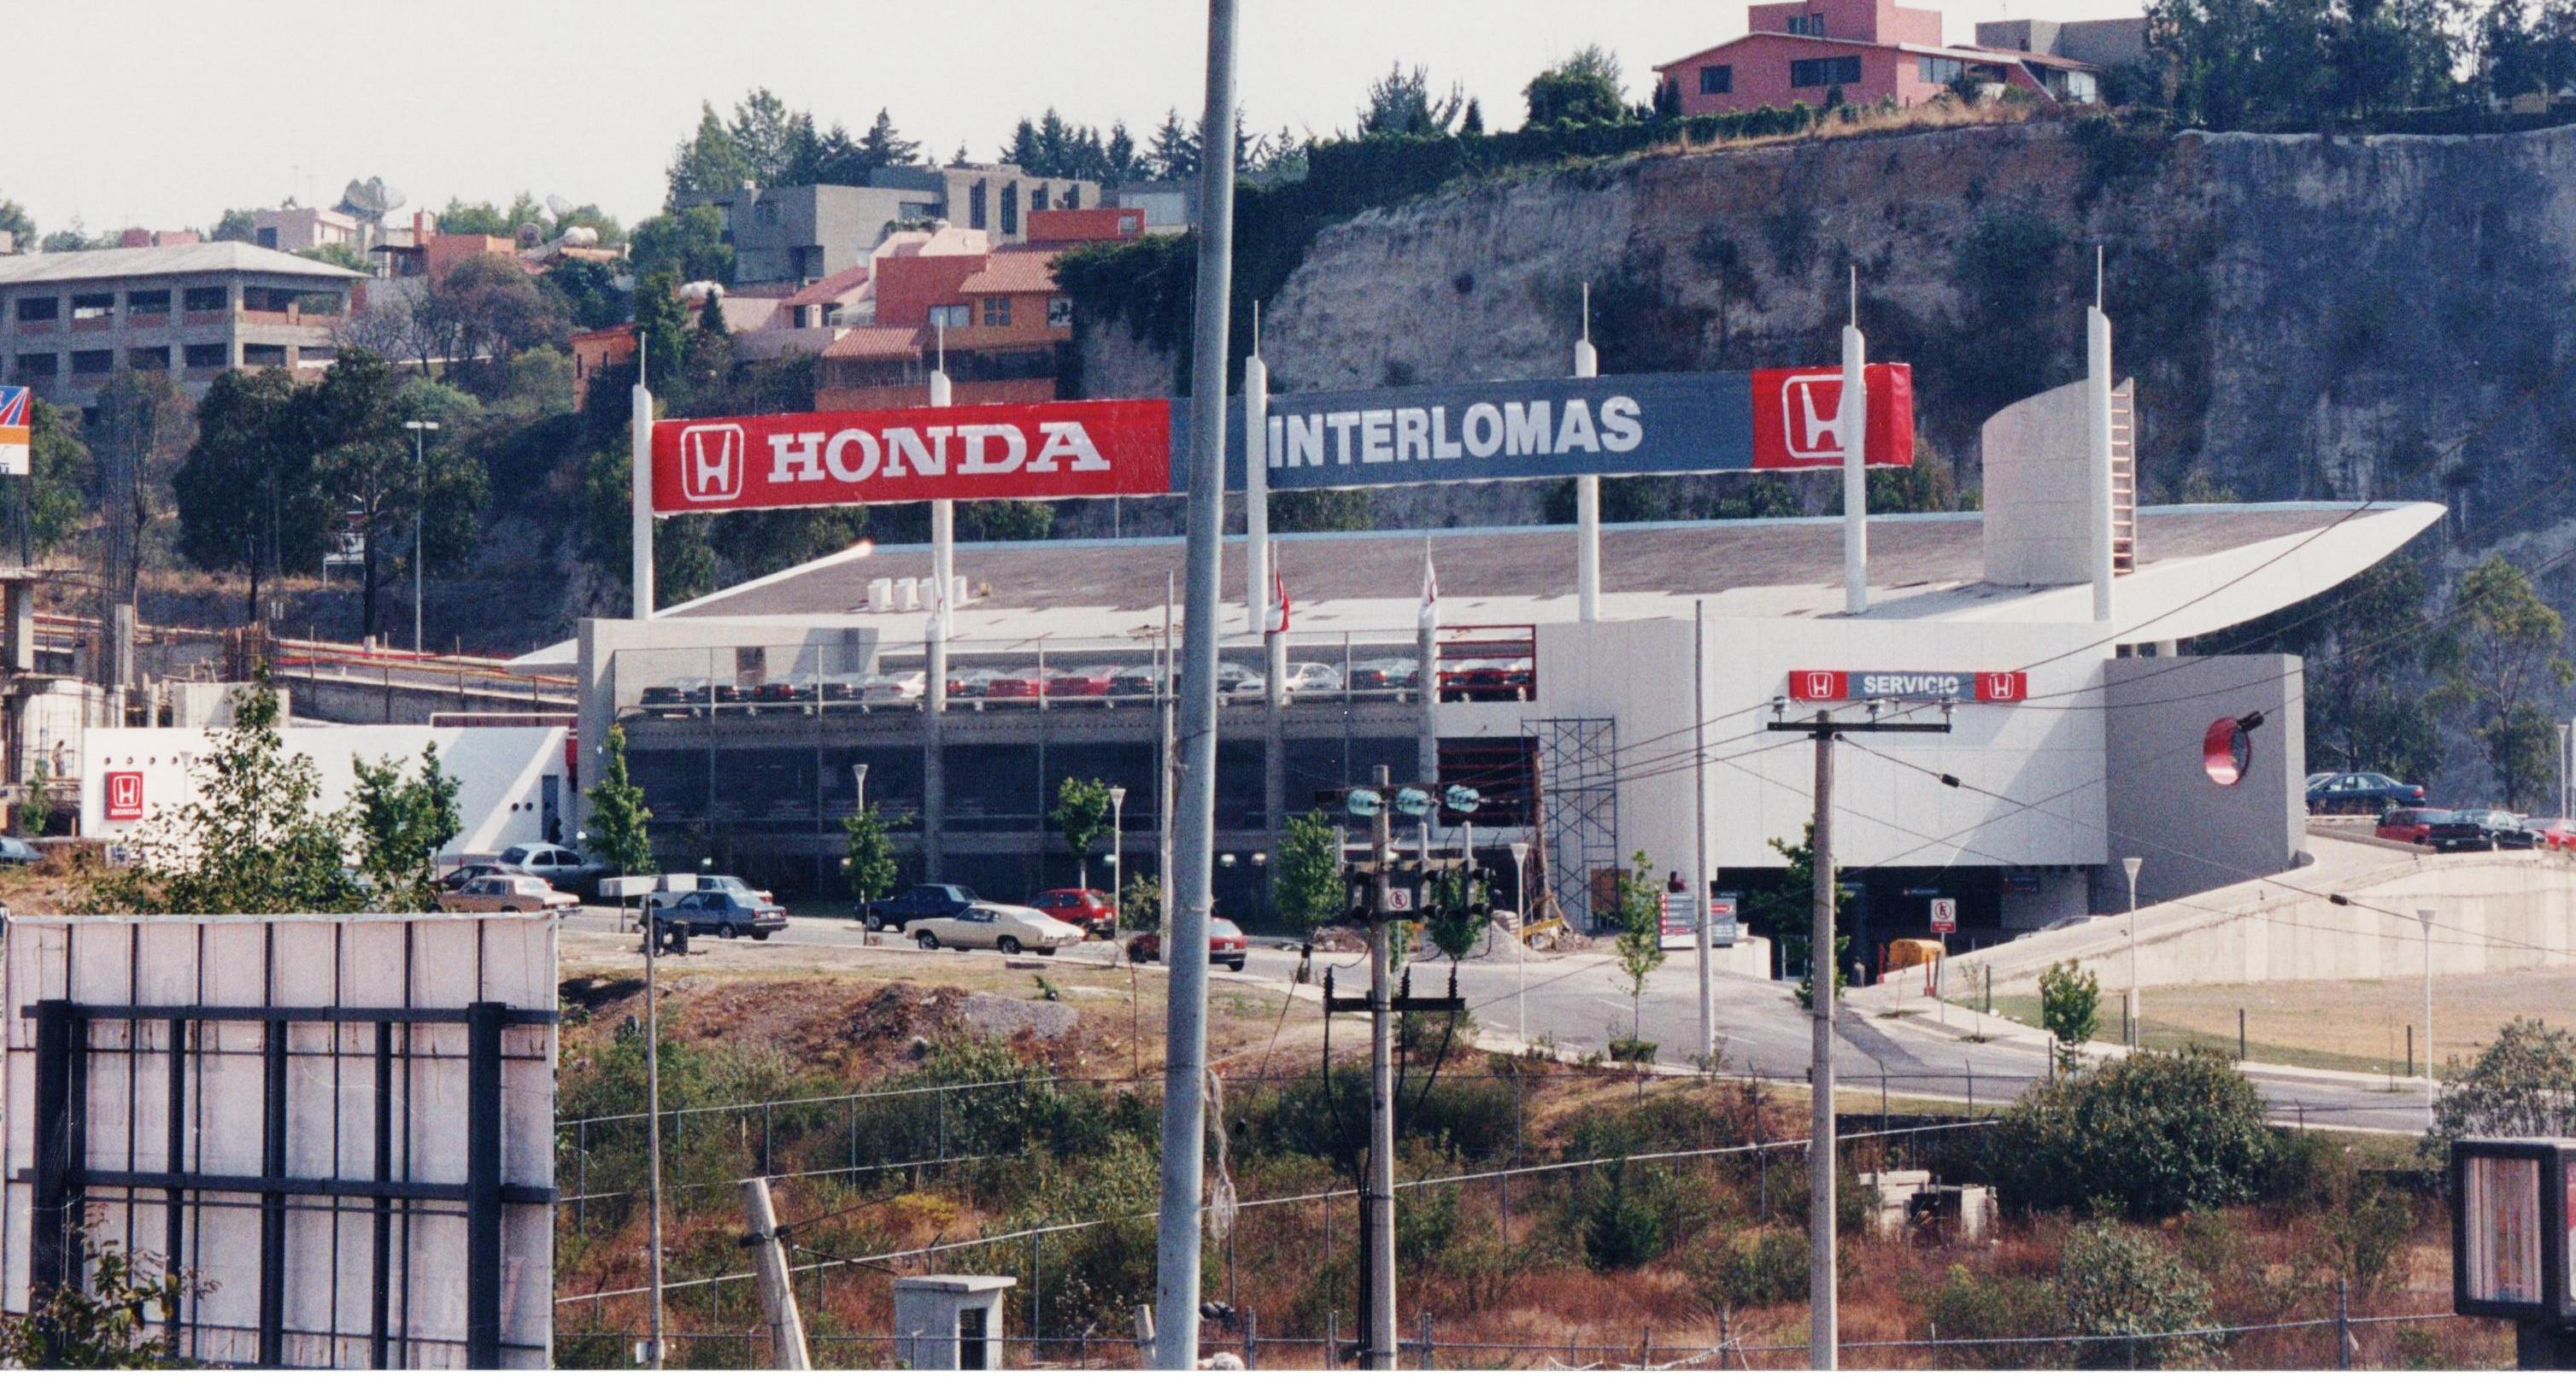 HONDA INTERLOMAS